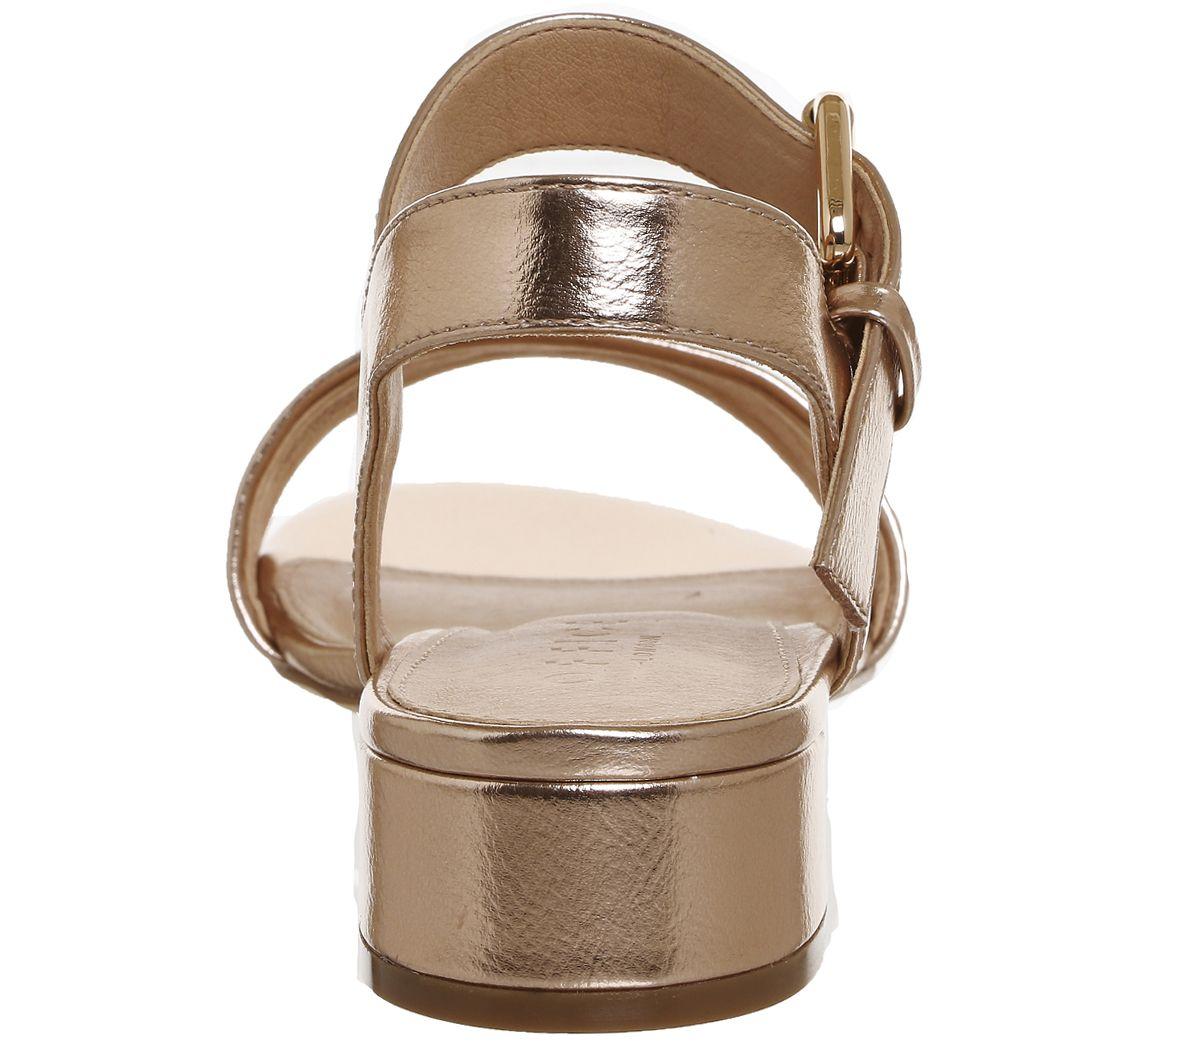 f66b924f91c Office Morgan Block Heel Sandals Rose Gold - Mid Heels